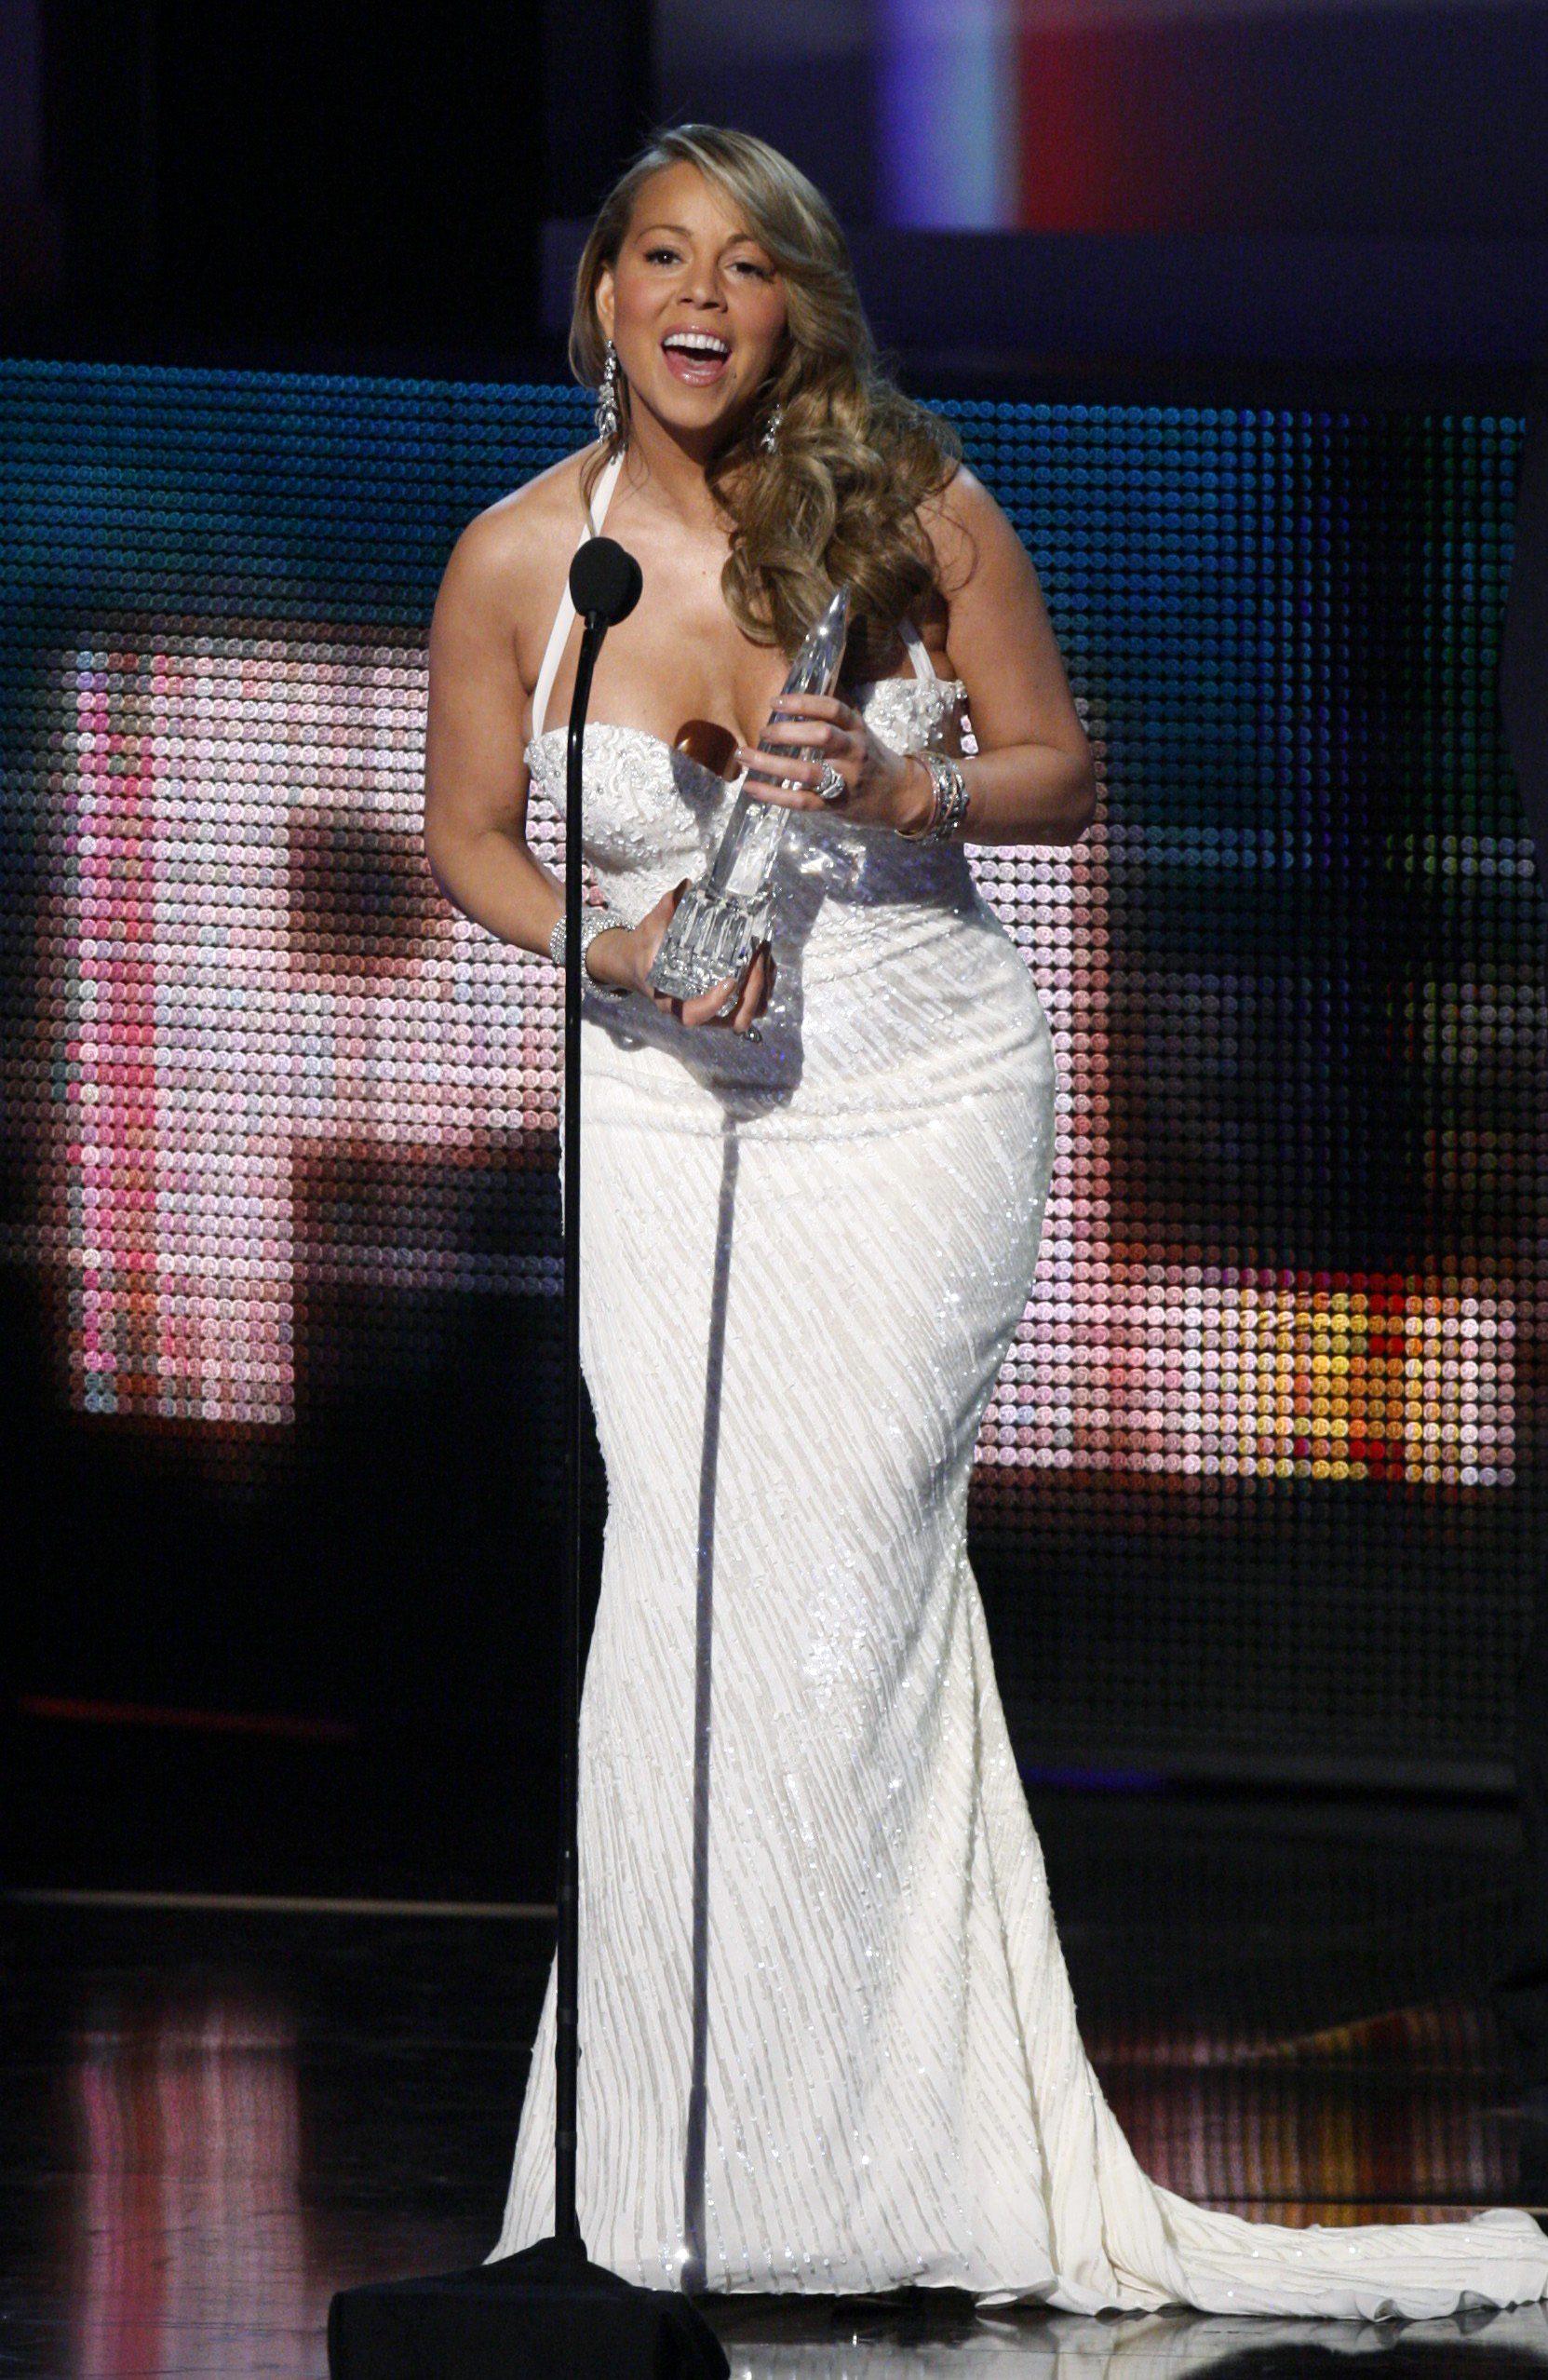 75524_mariah_carey_peoples_choice_awards._6_2010_568_120747_122_641lo.JPG